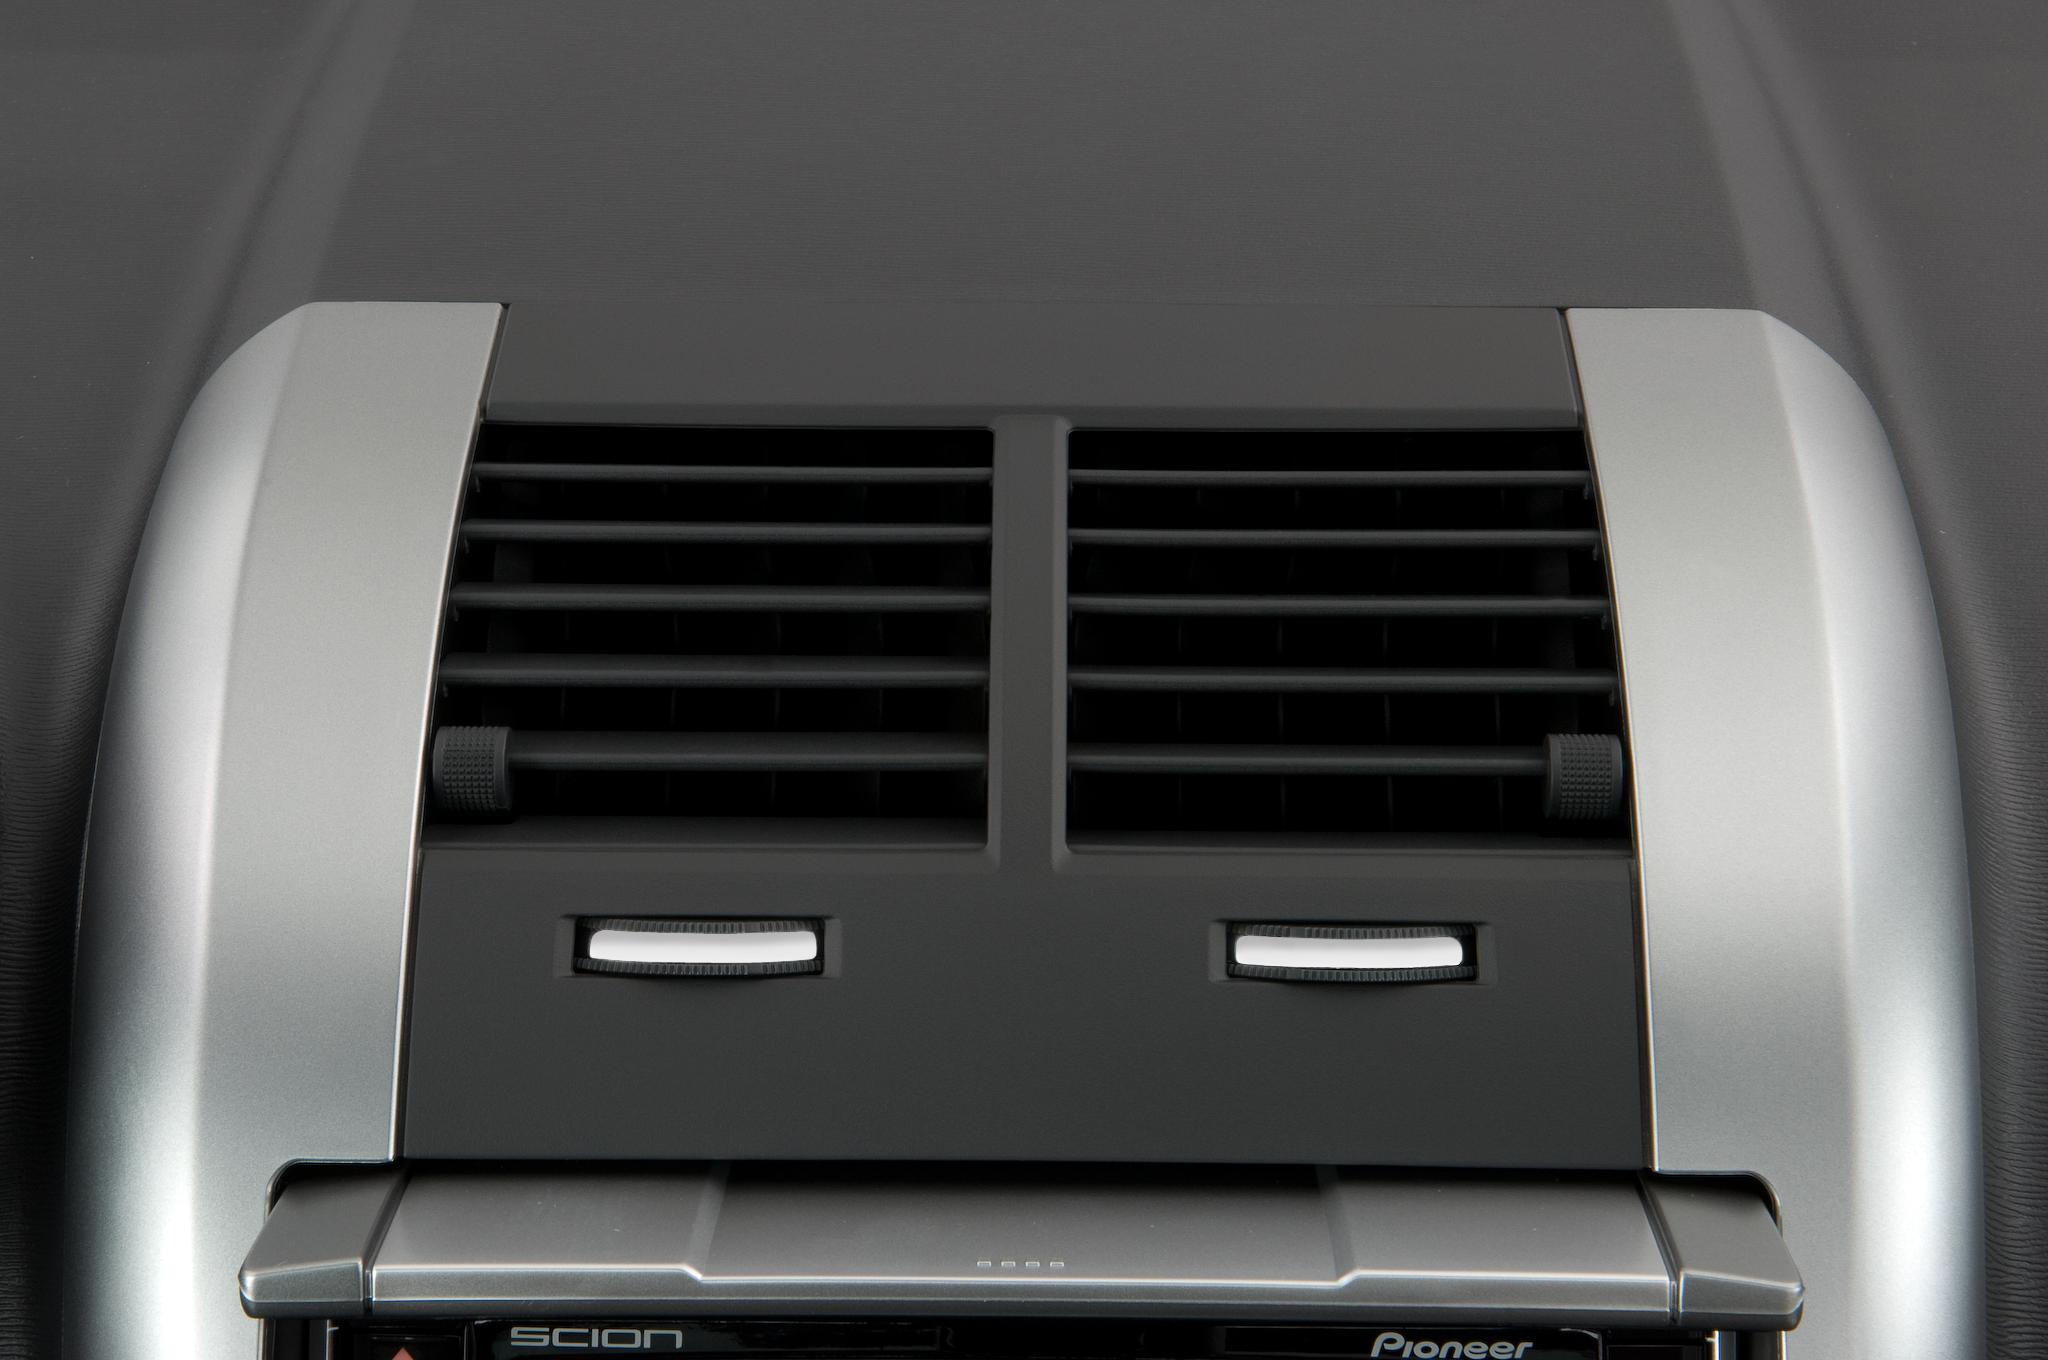 2015 Scion Tc 0 60 >> 2010 Chicago: Scion Announces tC Release Series 6.0, Starts at $19,290